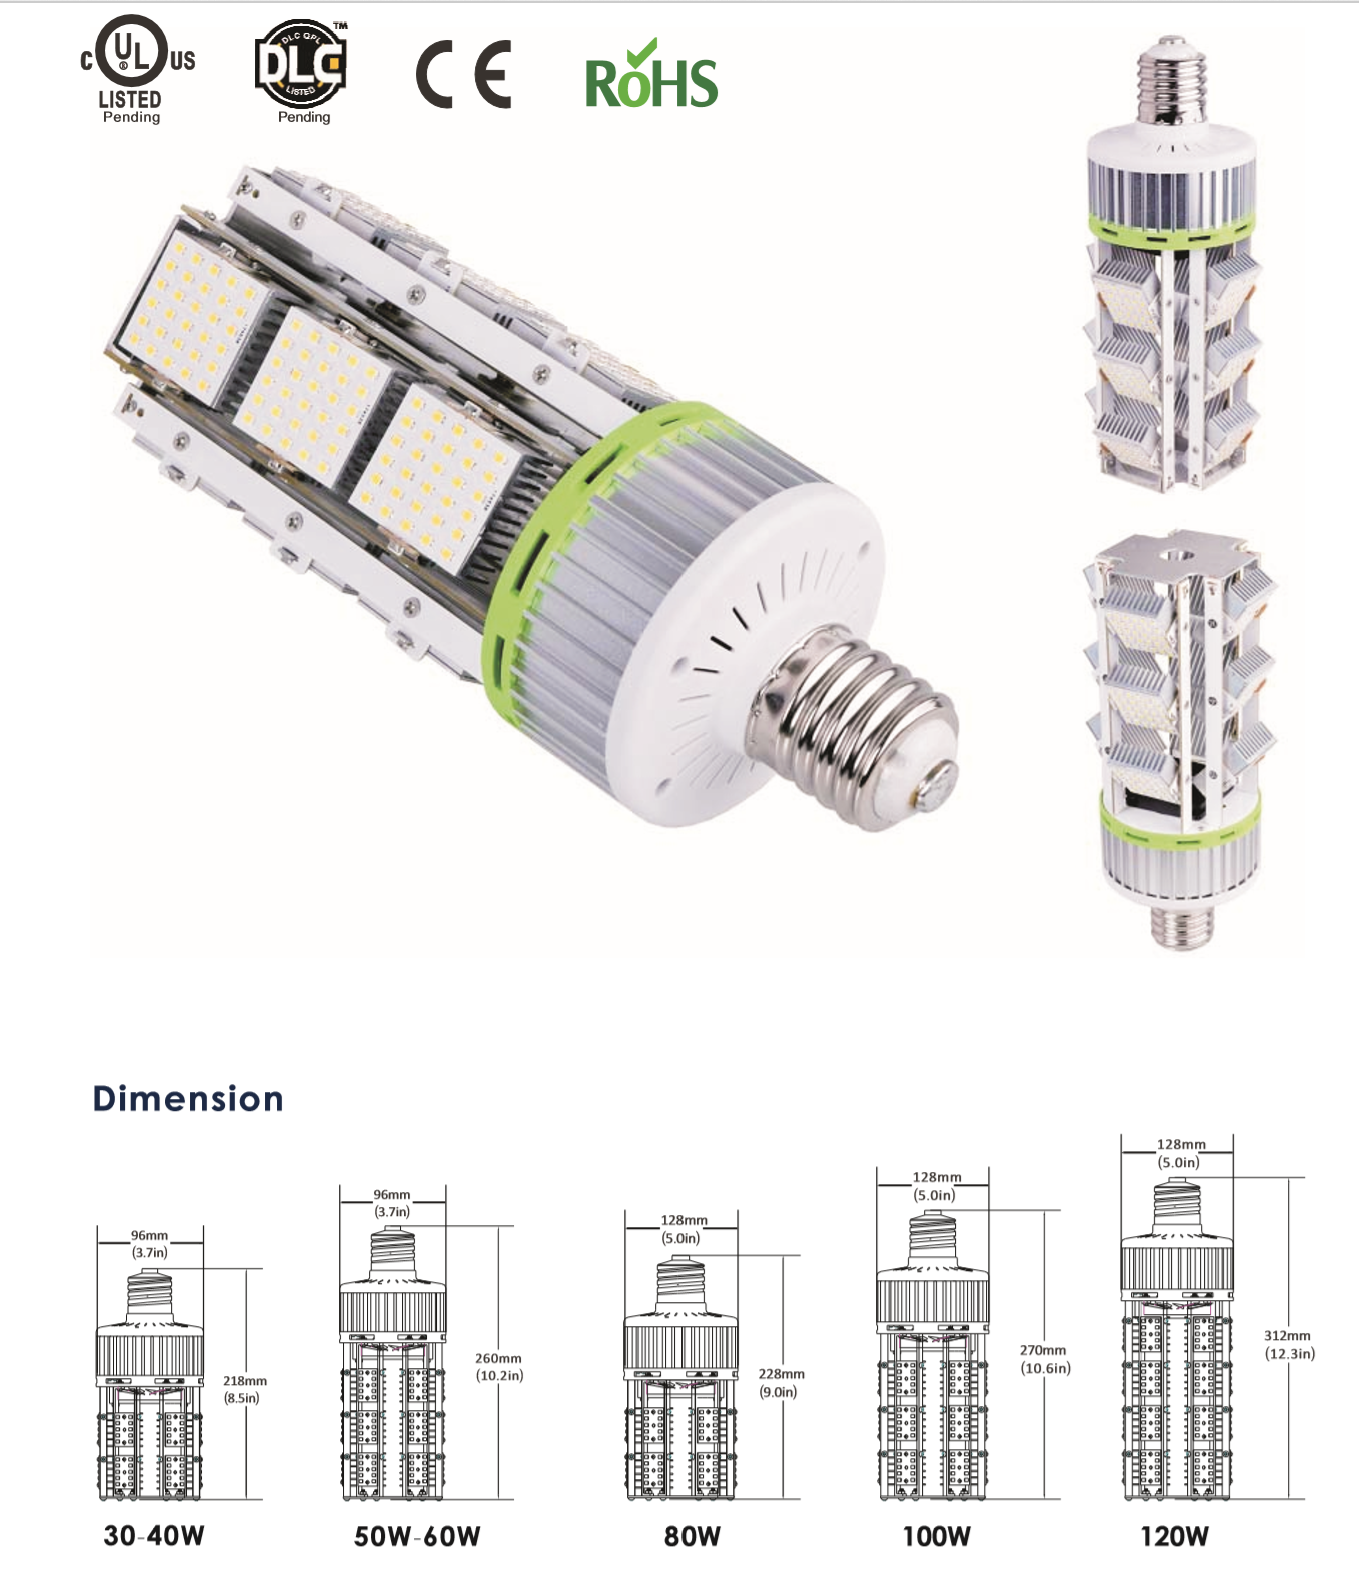 Led Module Adjustable Light | Led Light Module Adjustable Light | LED Light Bulbs | street light LED Light Bulbs | led street light bulb replacement | LED Retrofit Street Lighting | LED Parking Lot | LED Street Lights